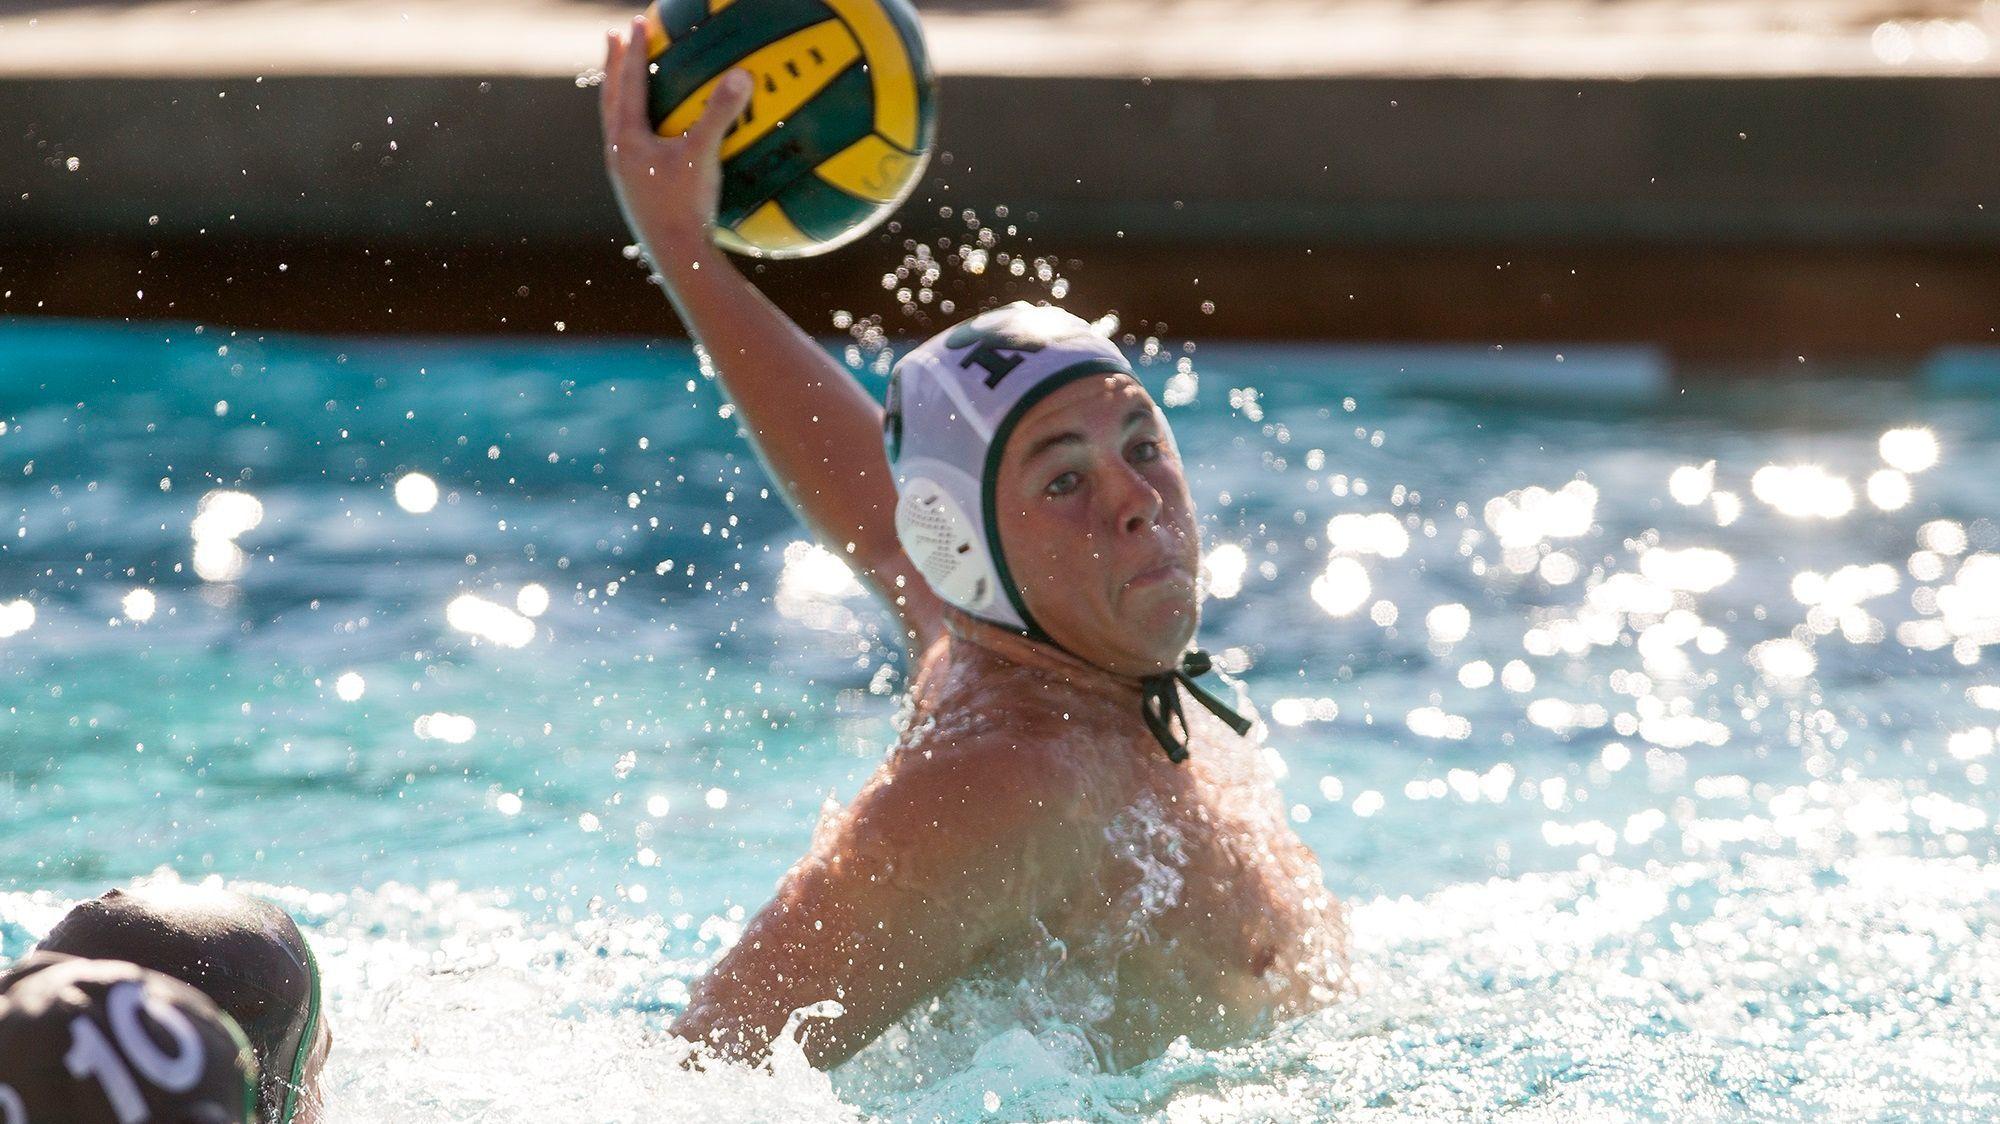 Costa Mesa boys' water polo player Caedmon Fisher